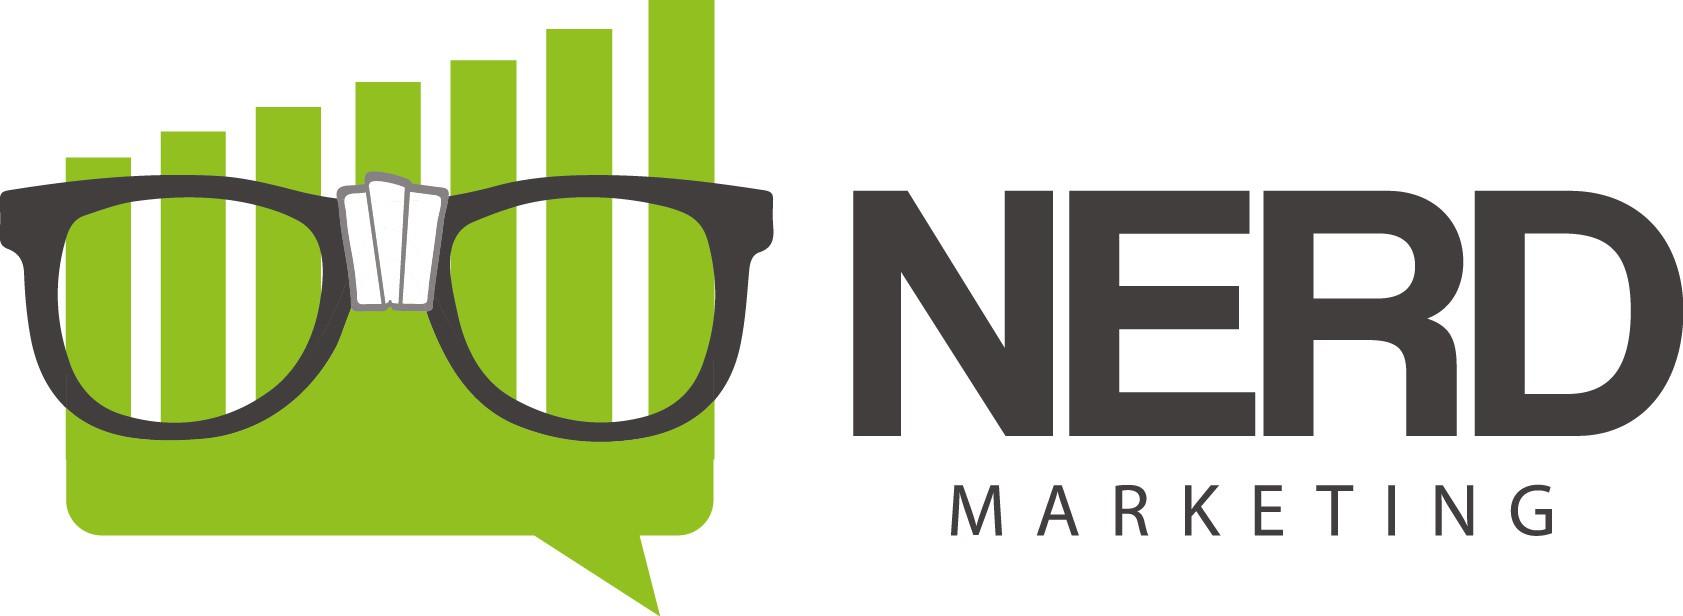 Create a logo for my marketing blog